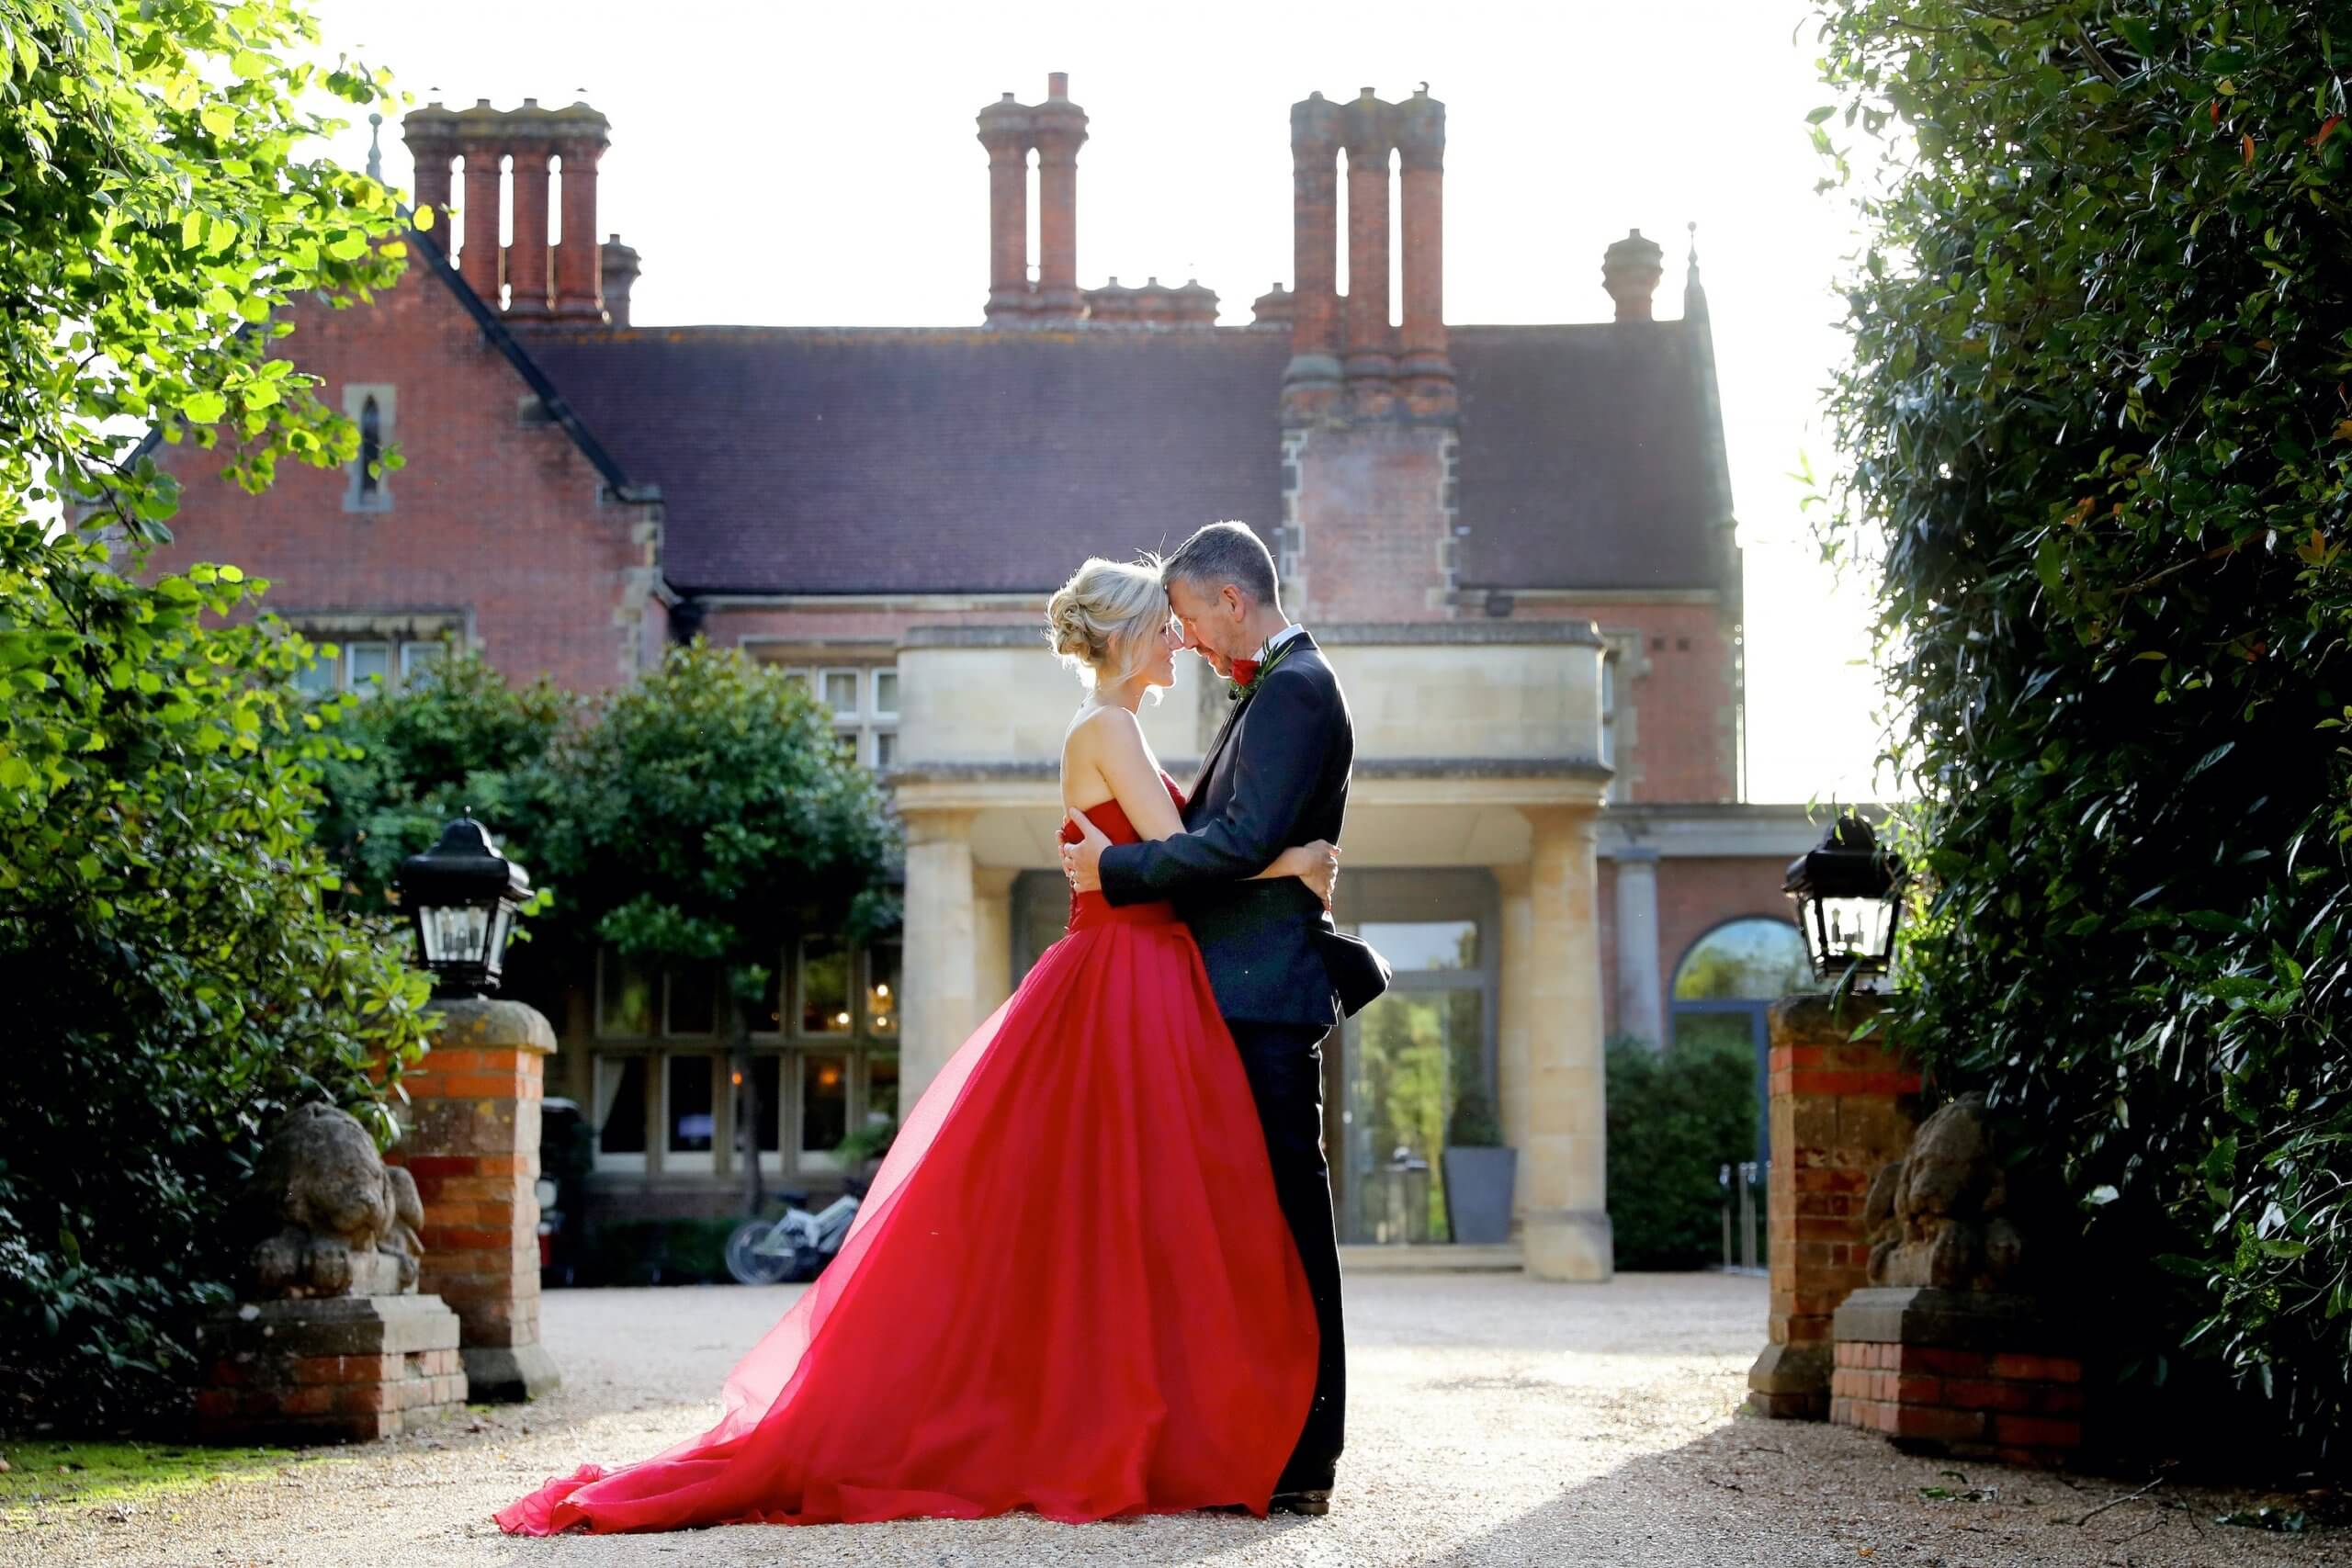 THAT RED WEDDING DRESS SUSSEX